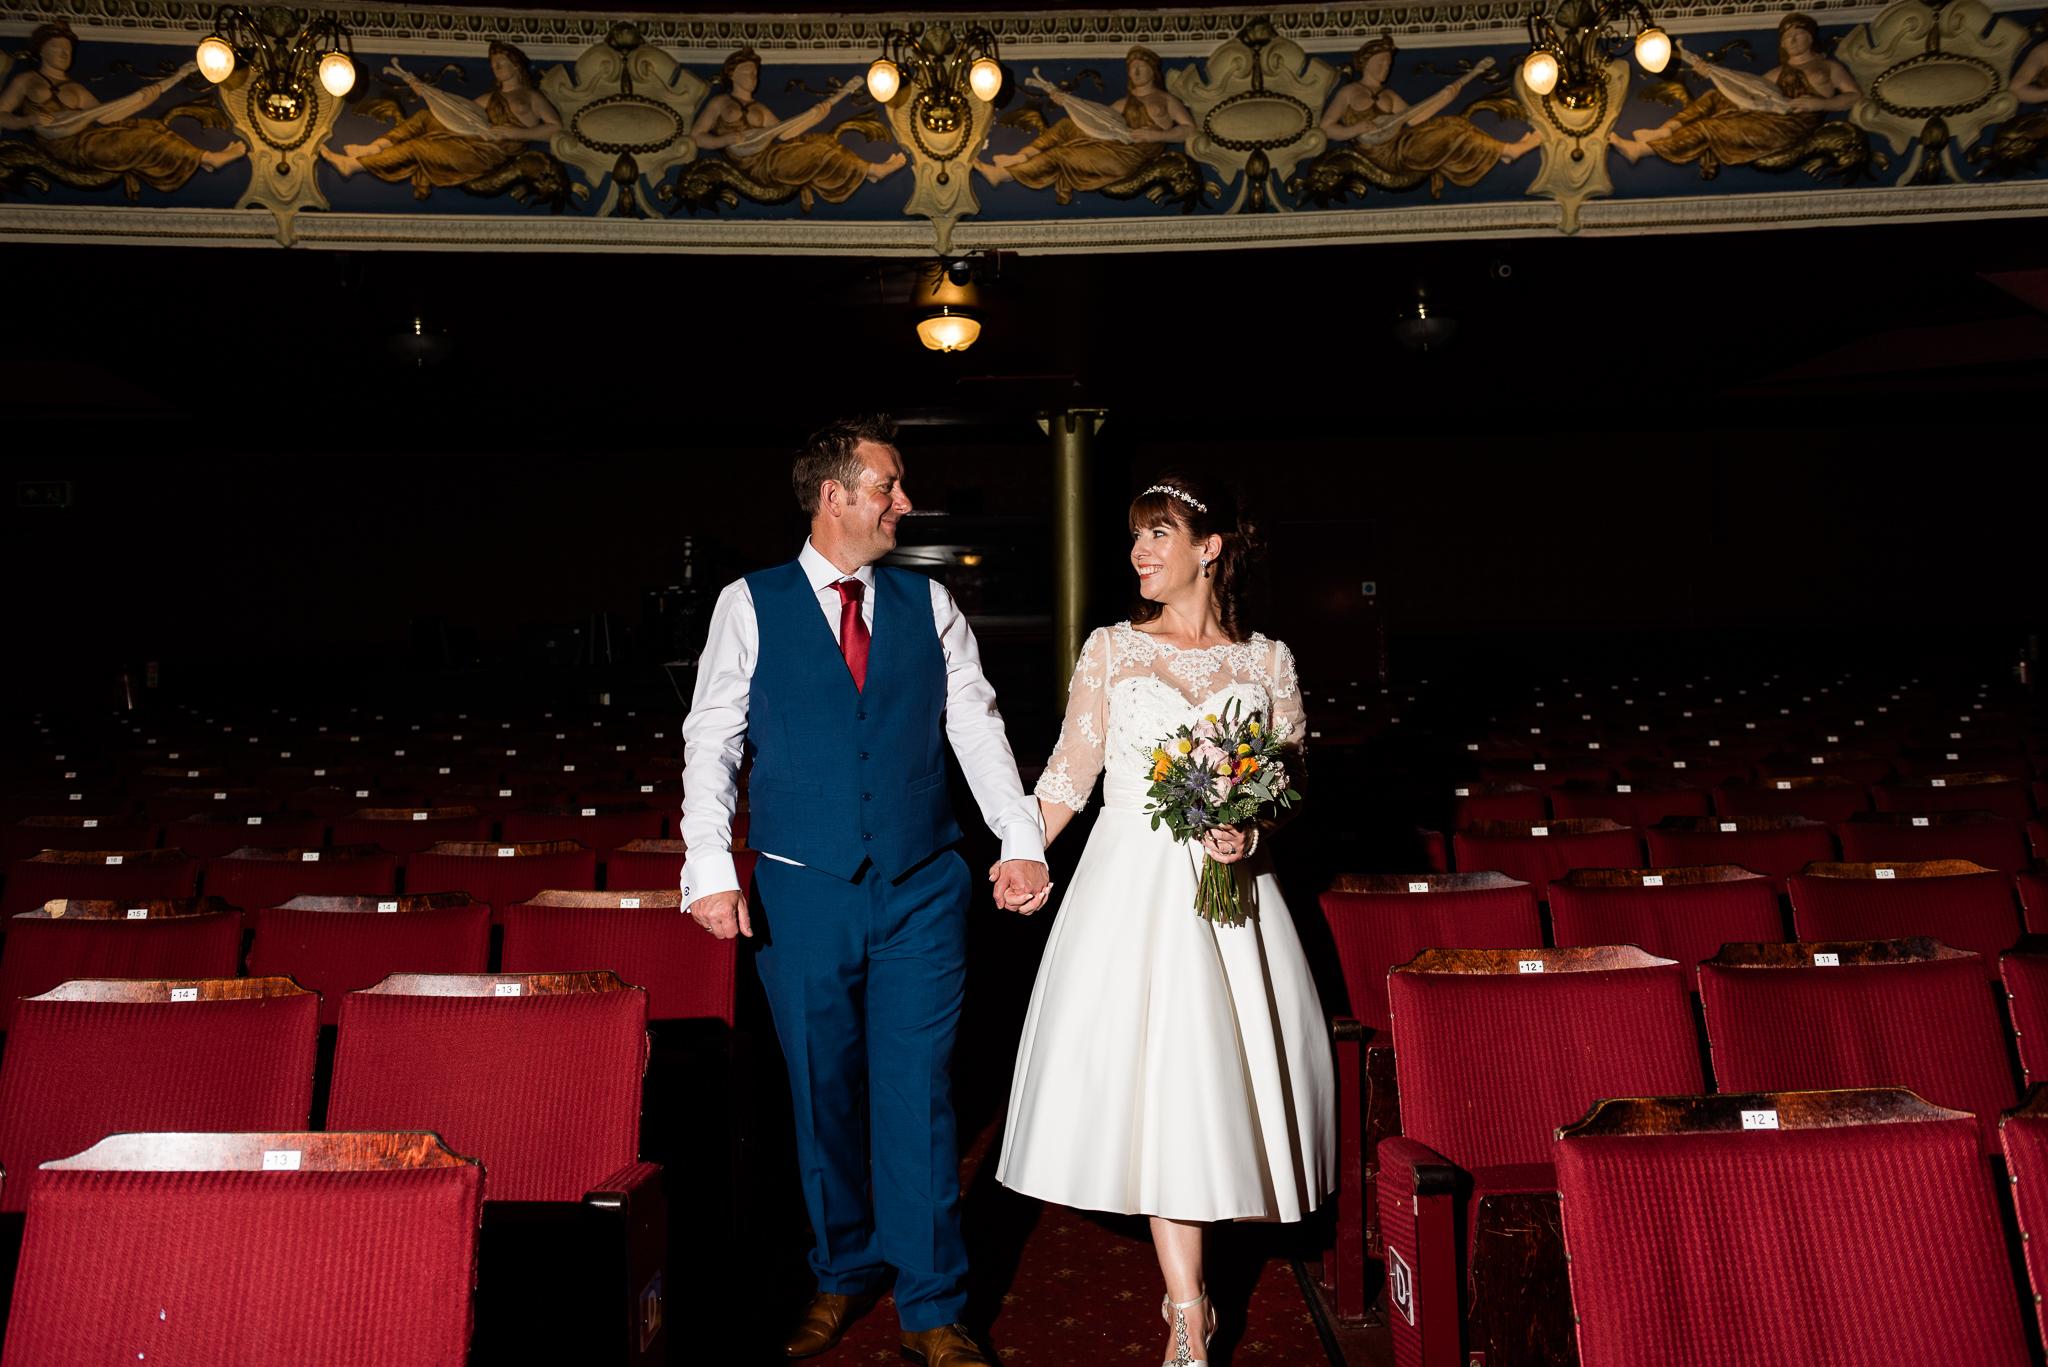 Cheshire Wedding Photography at Crewe Lyceum Theatre Stage Wedding Art Deco 20s - Jenny Harper-31.jpg